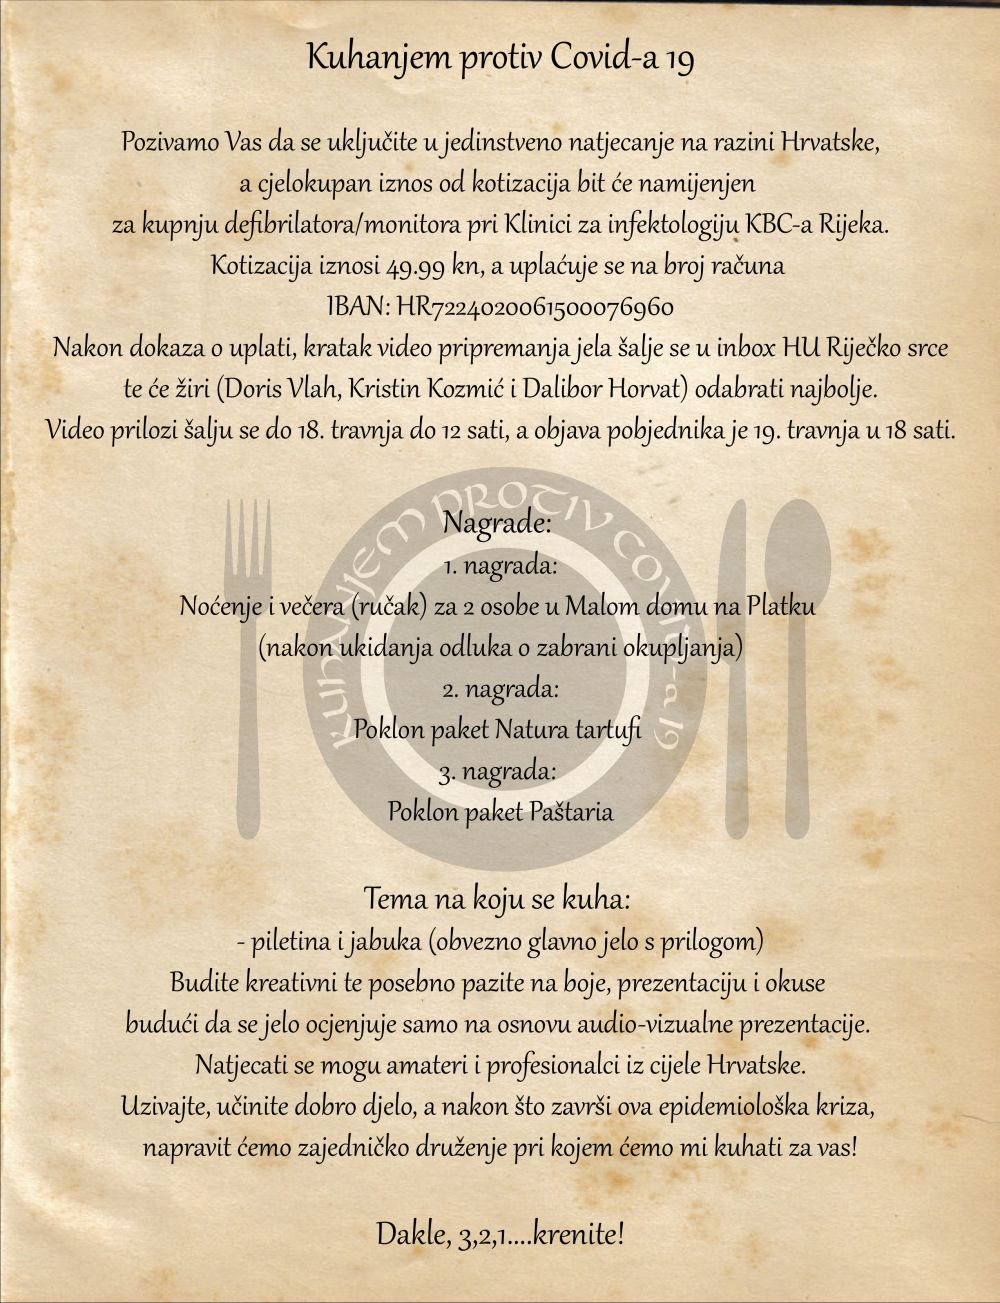 Kuhanjem protiv Covida 19